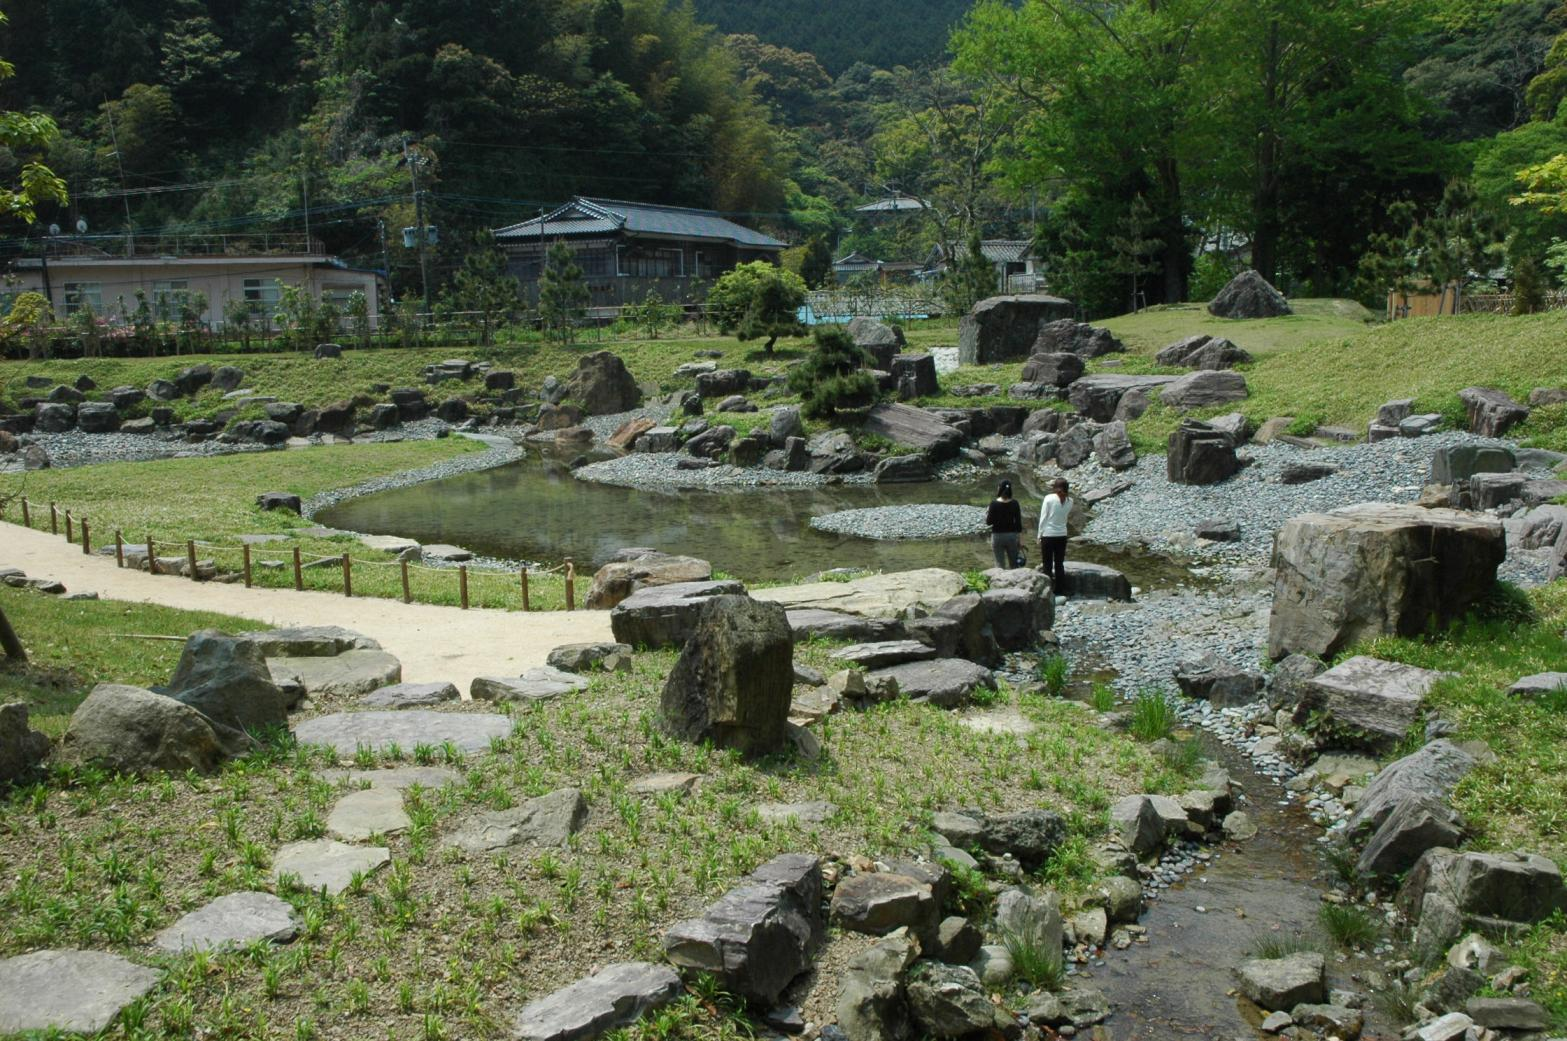 【Day 3】Ruins of Kaneishi Castle / Former Kaneishi Castle Gardens-1